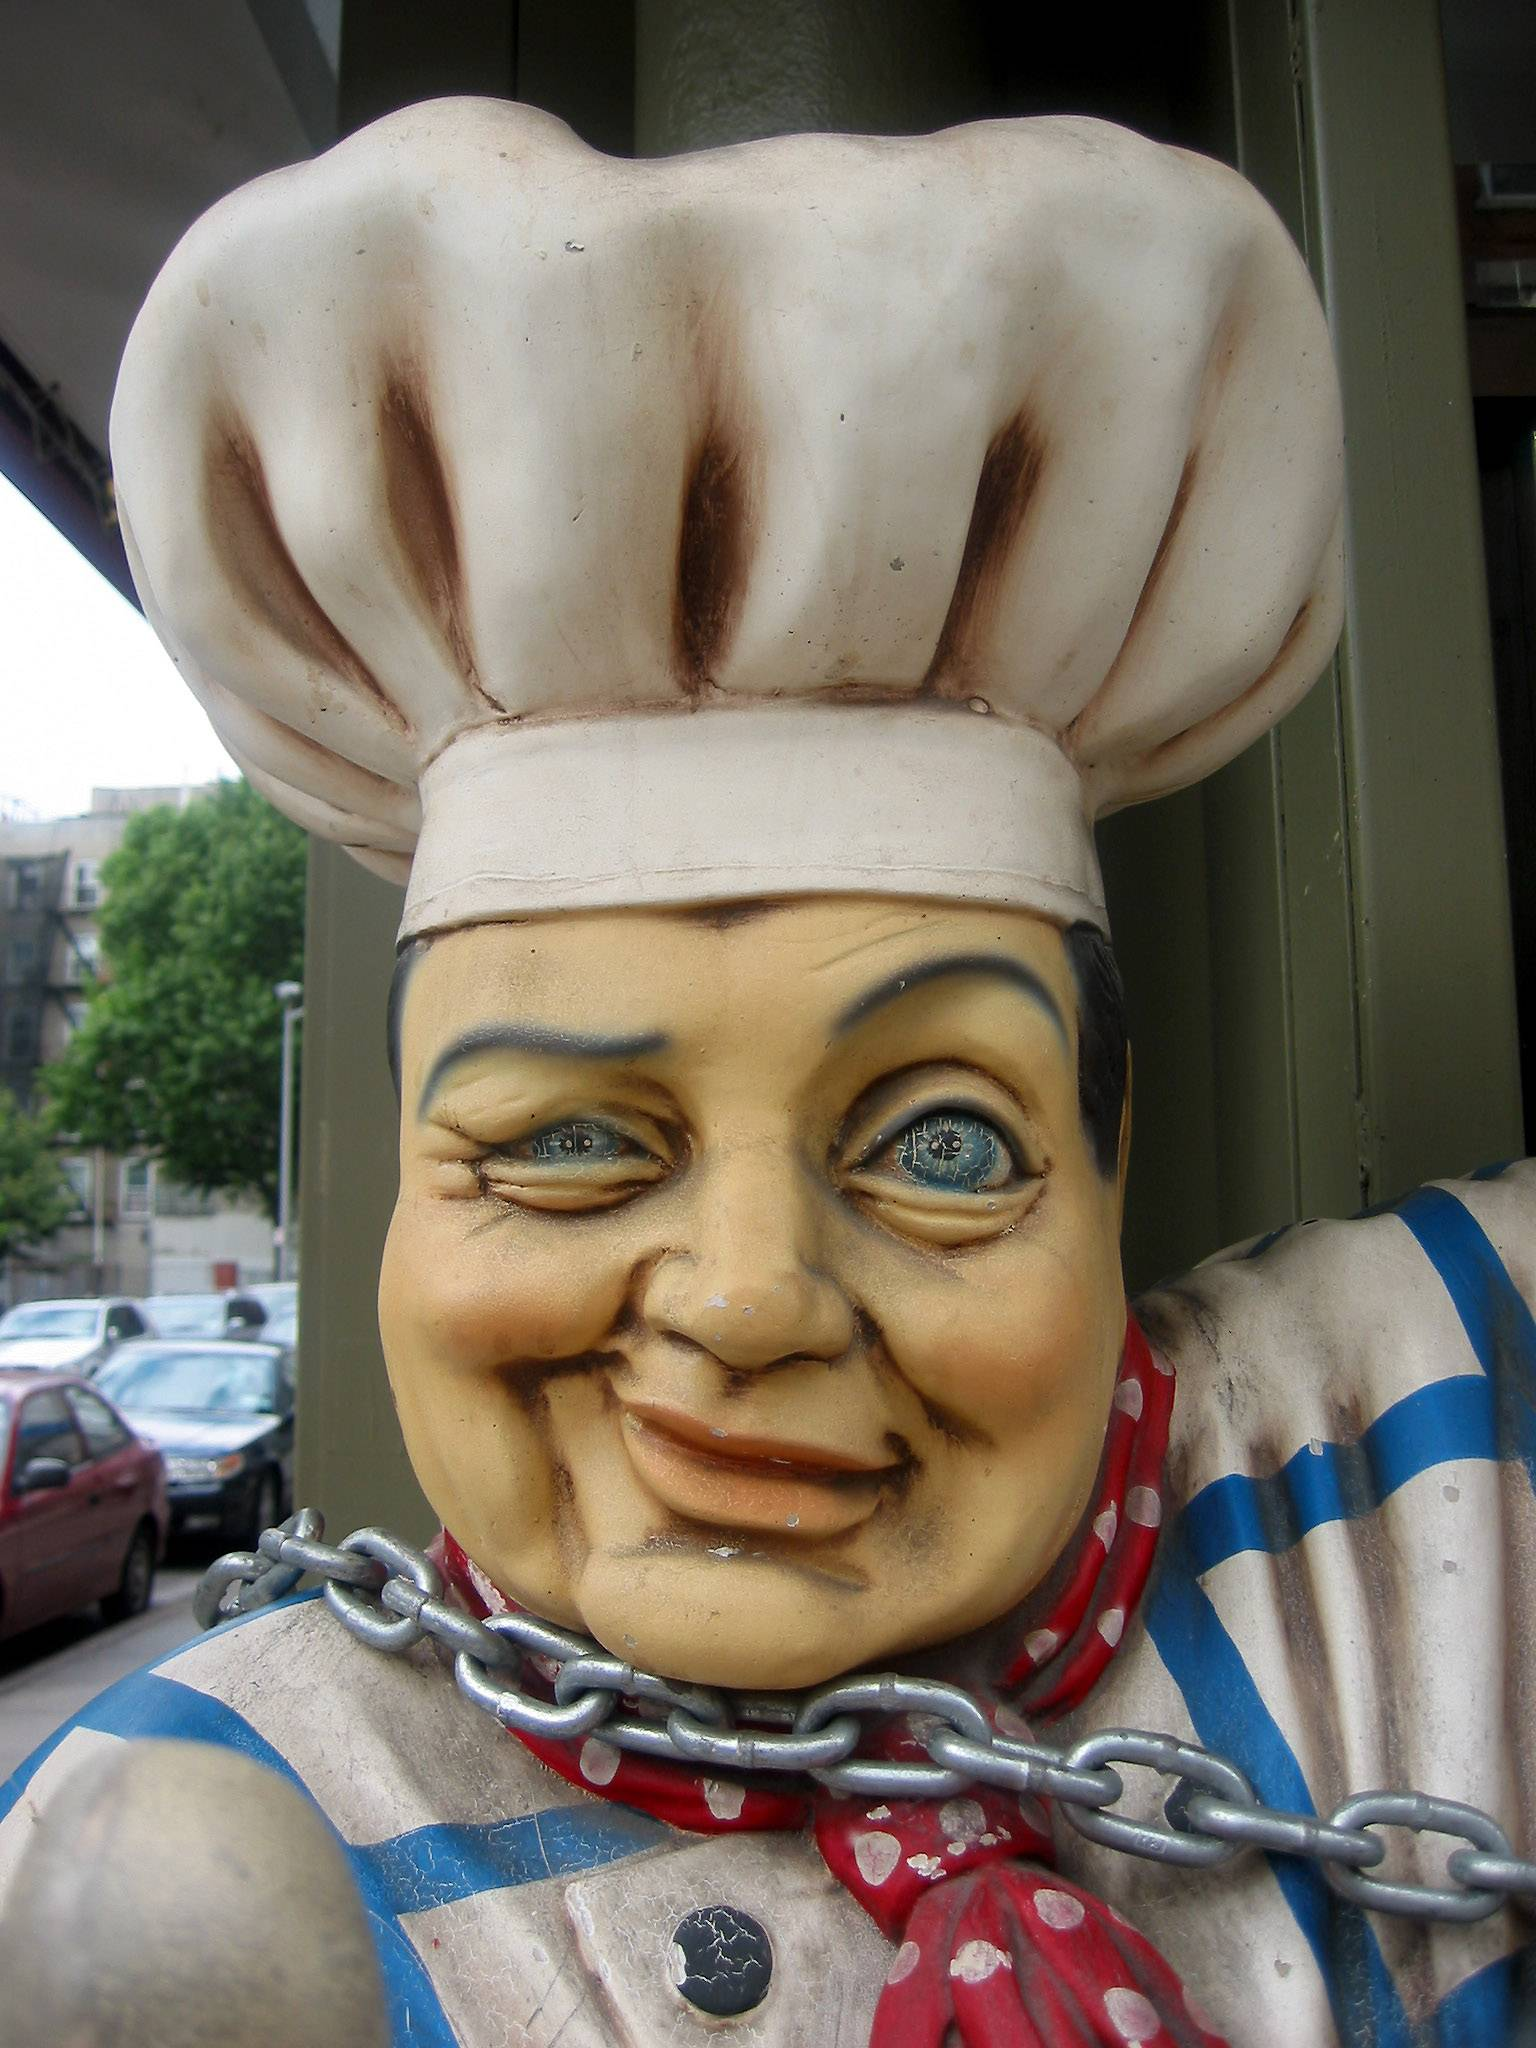 SOHO Chef in Bondage